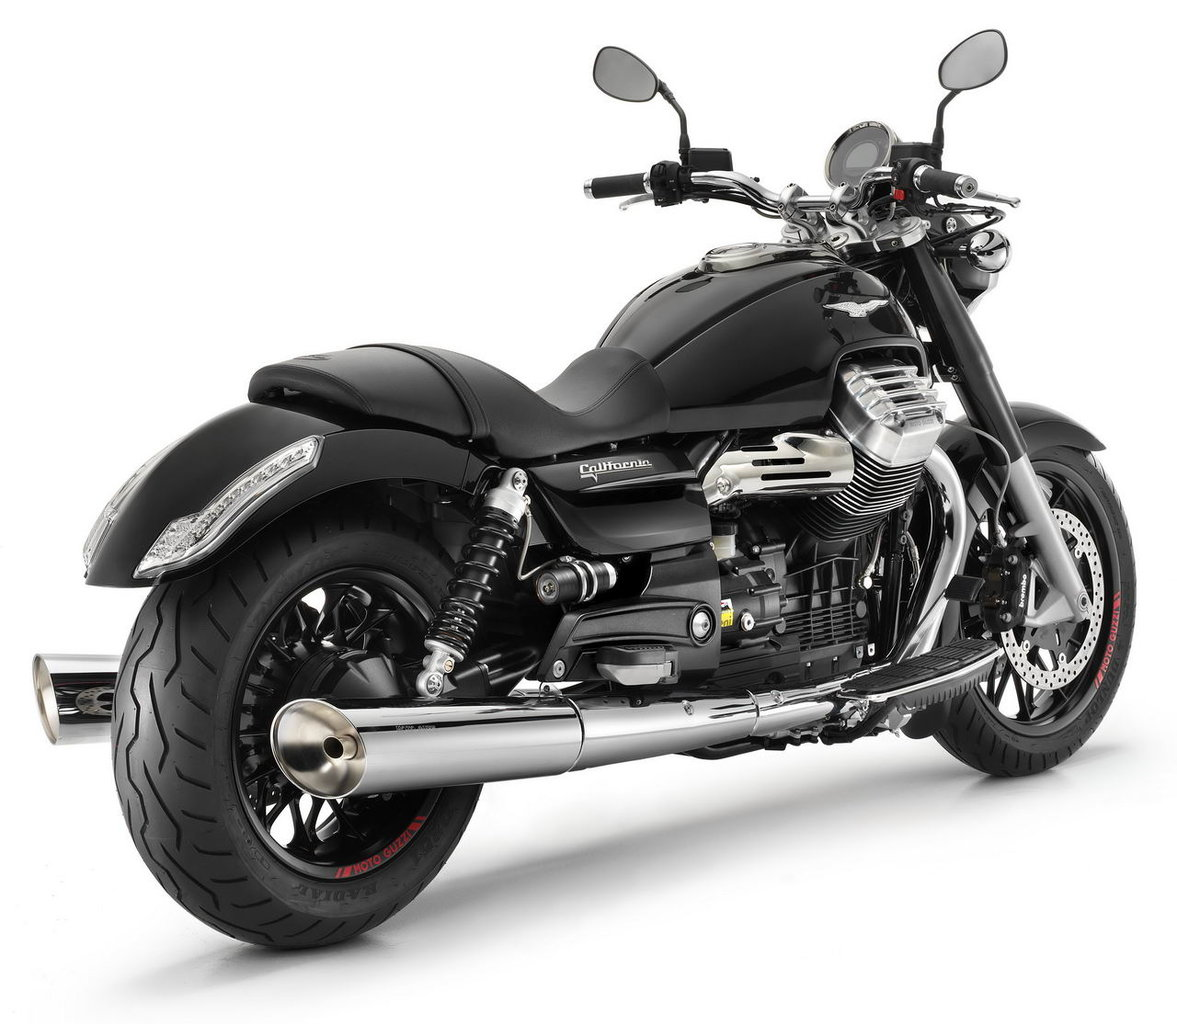 Listino Moto-Guzzi Bellagio 940 Custom e Cruiser - image 15582_moto-guzzi-california1400-custom on https://moto.motori.net